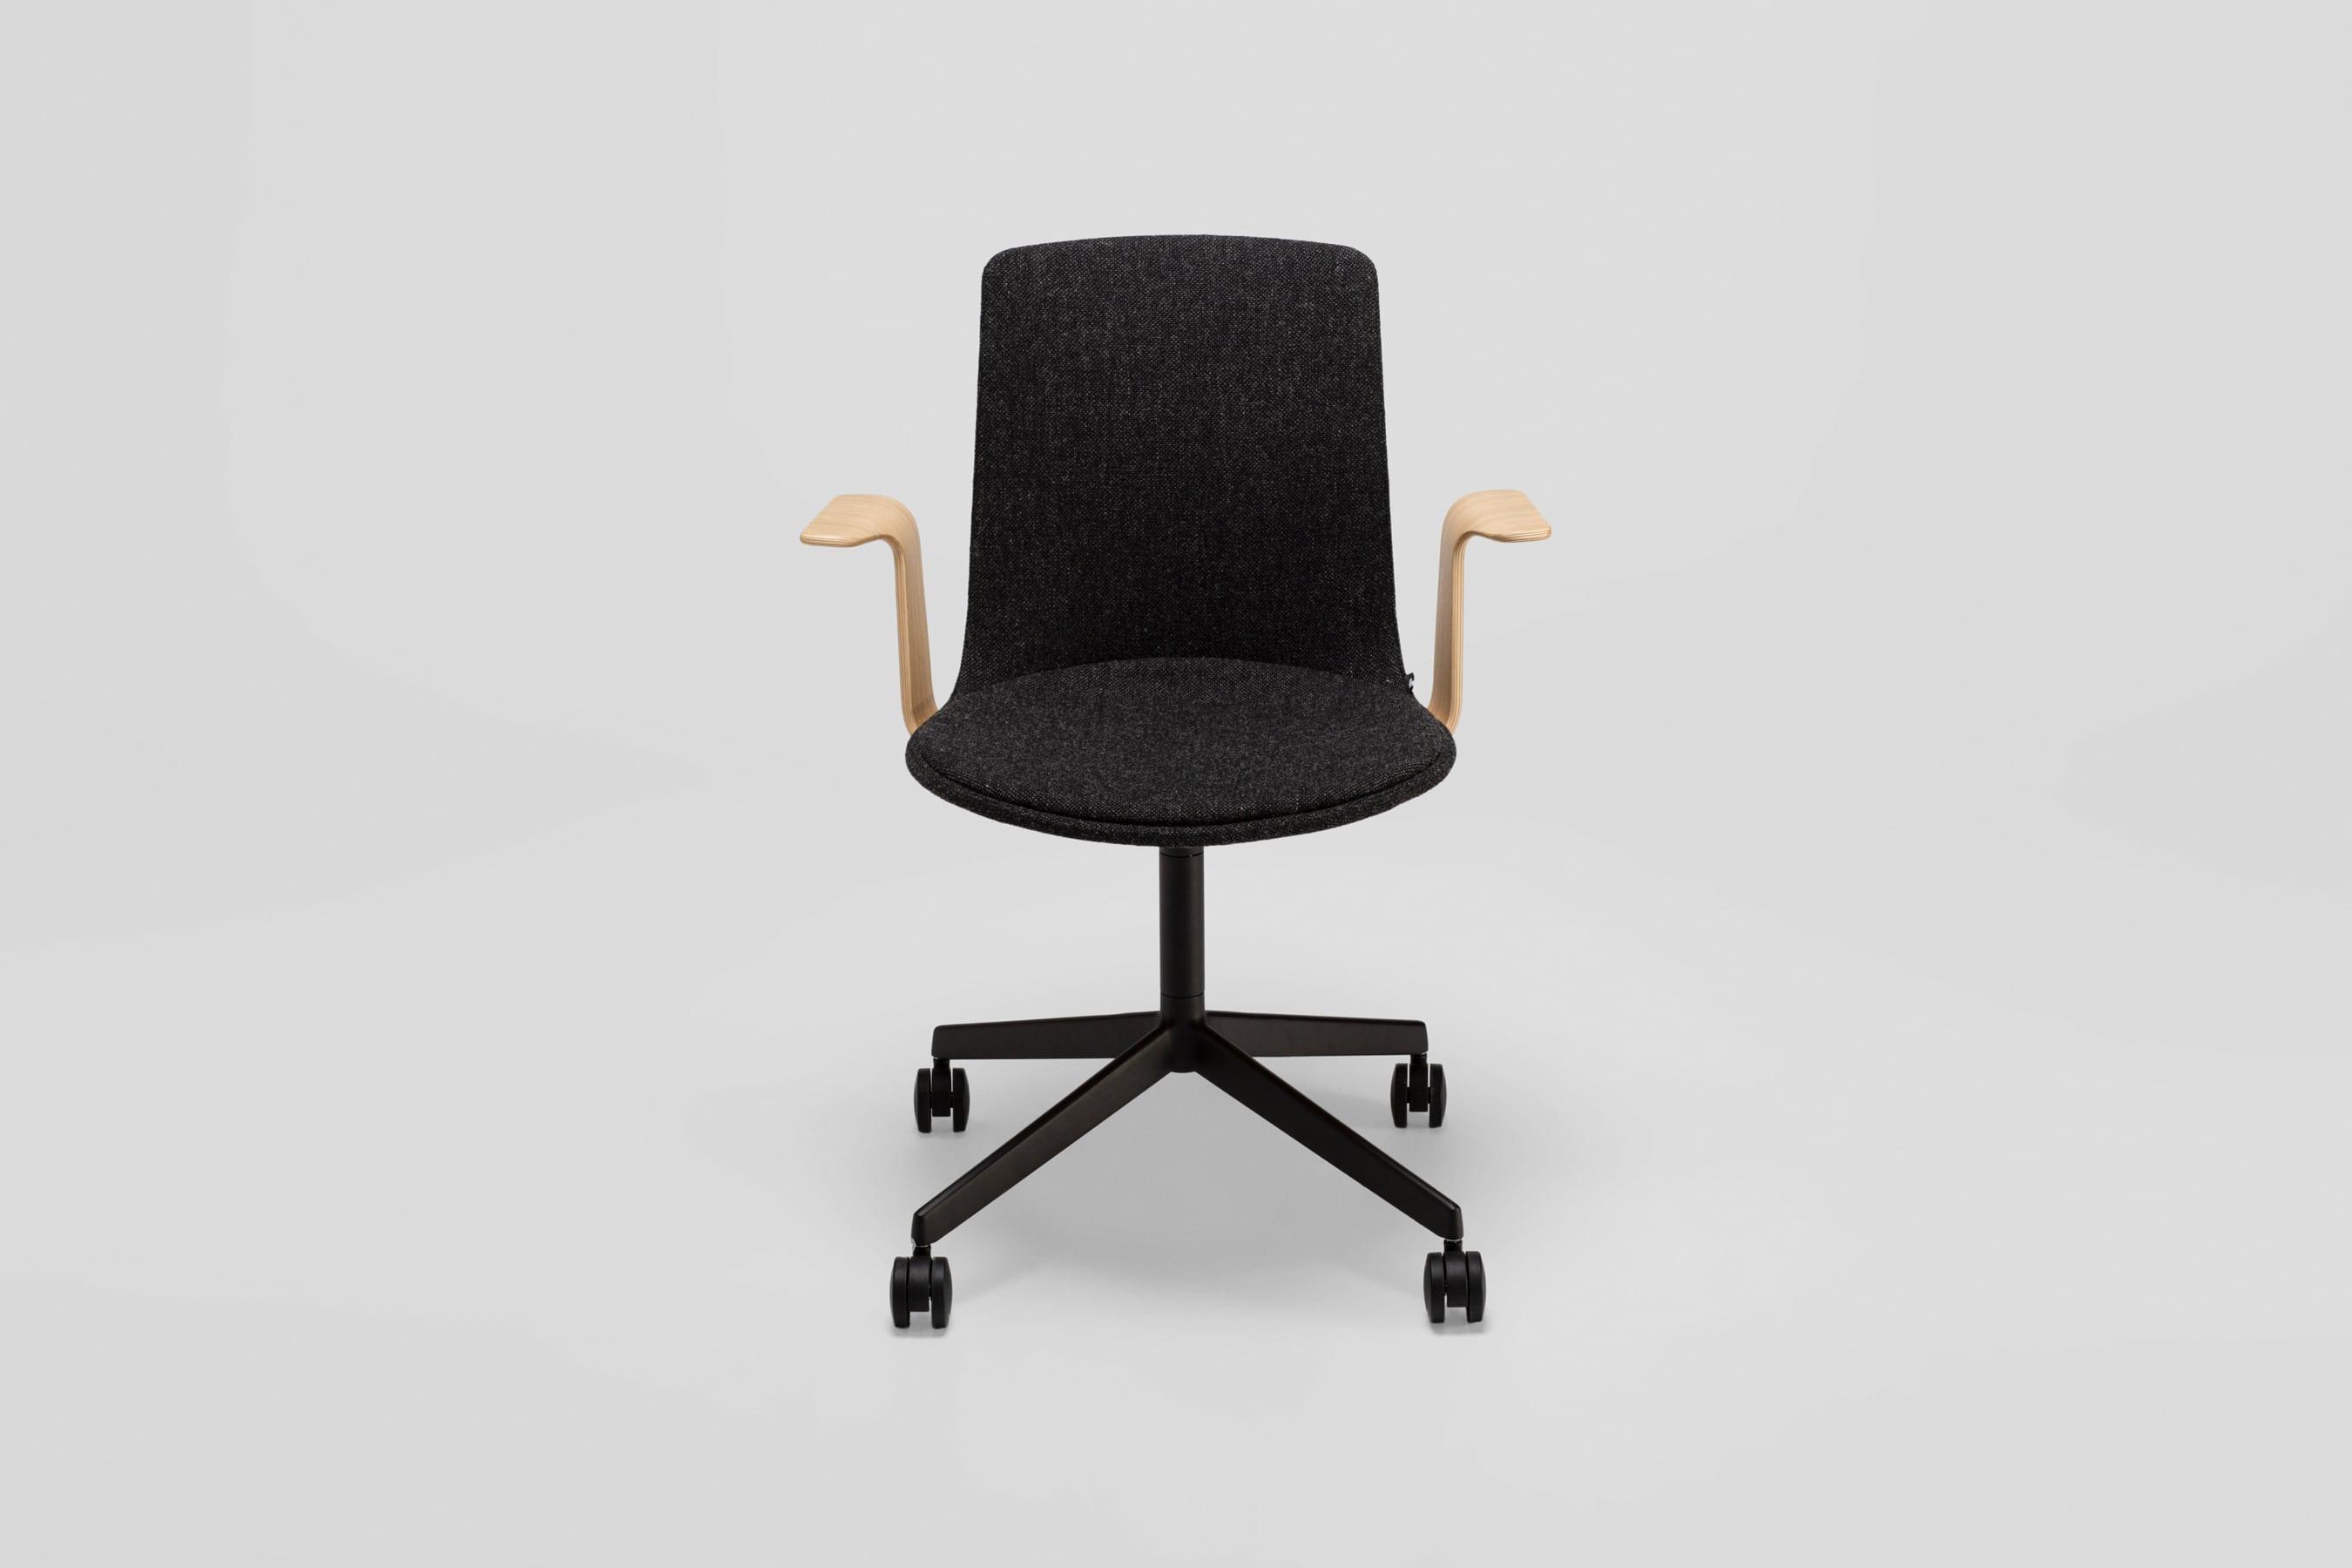 Lottus High confident chaise